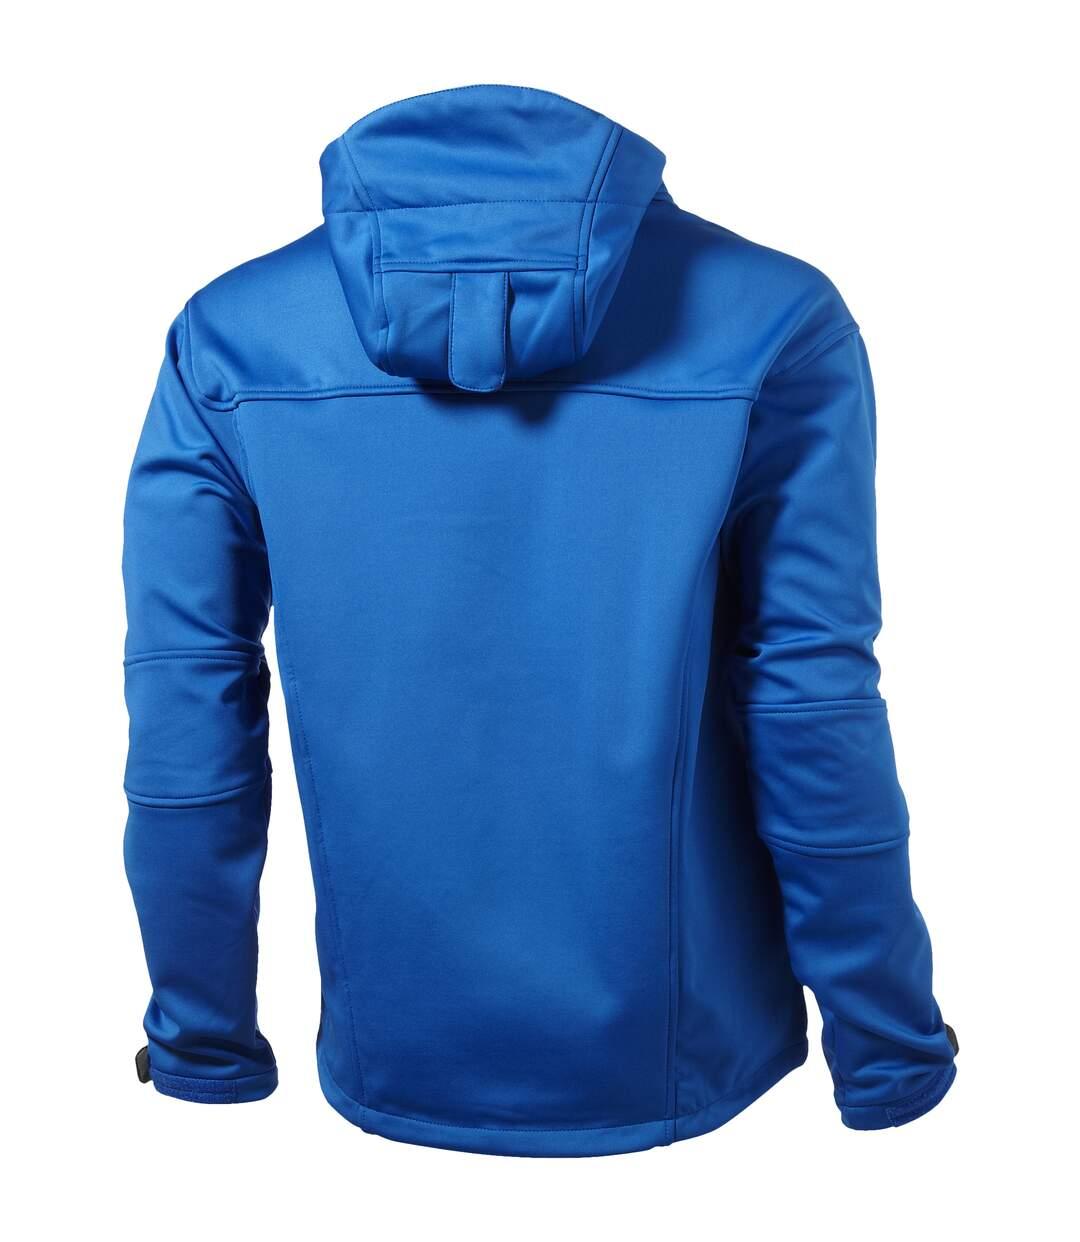 Slazenger - Veste Softshell Match - Homme (Bleu ciel) - UTPF1771